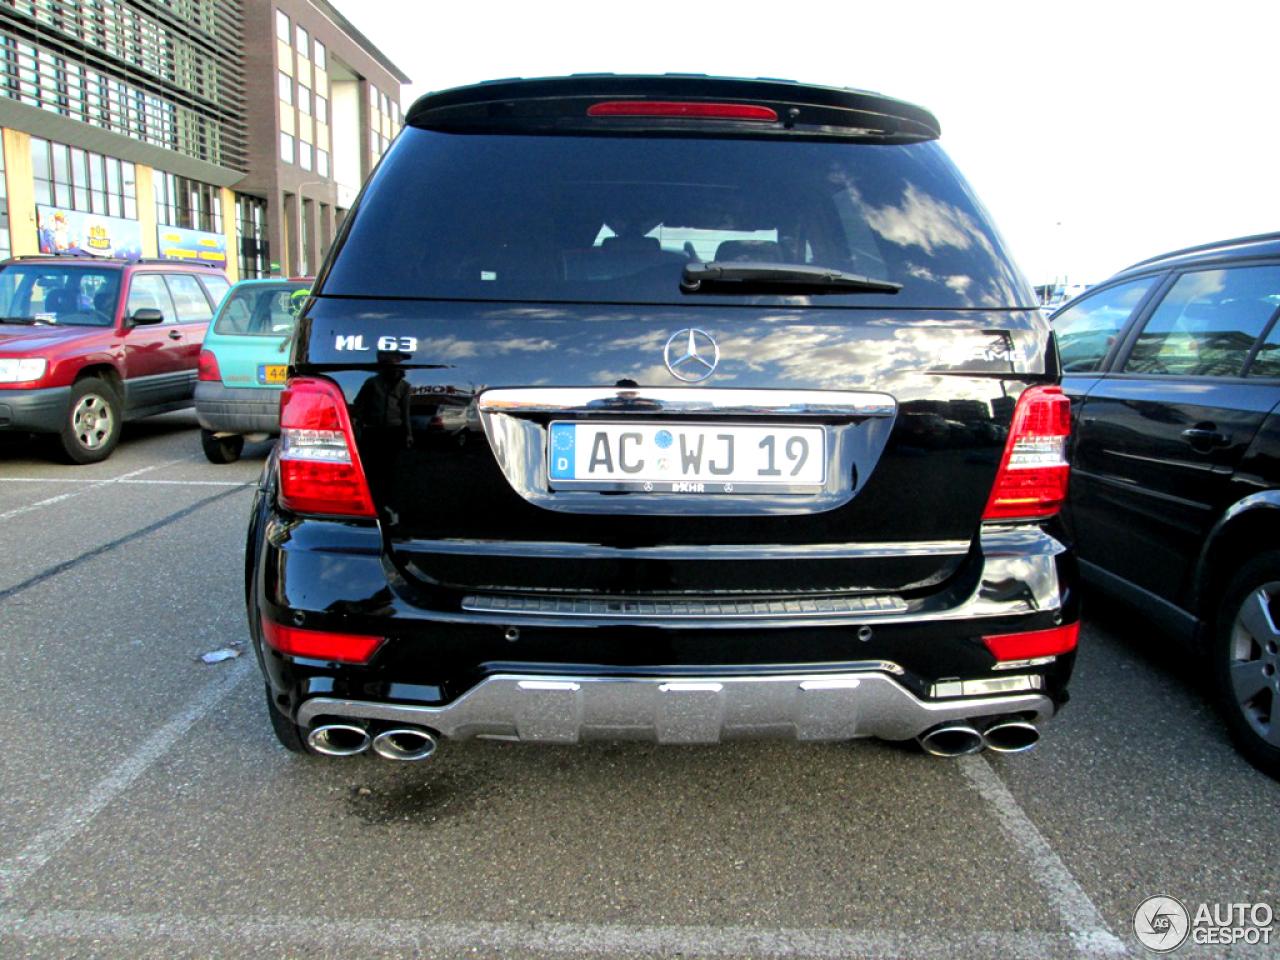 Mercedes benz ml 63 amg w164 2009 26 november 2012 for 2009 mercedes benz suv